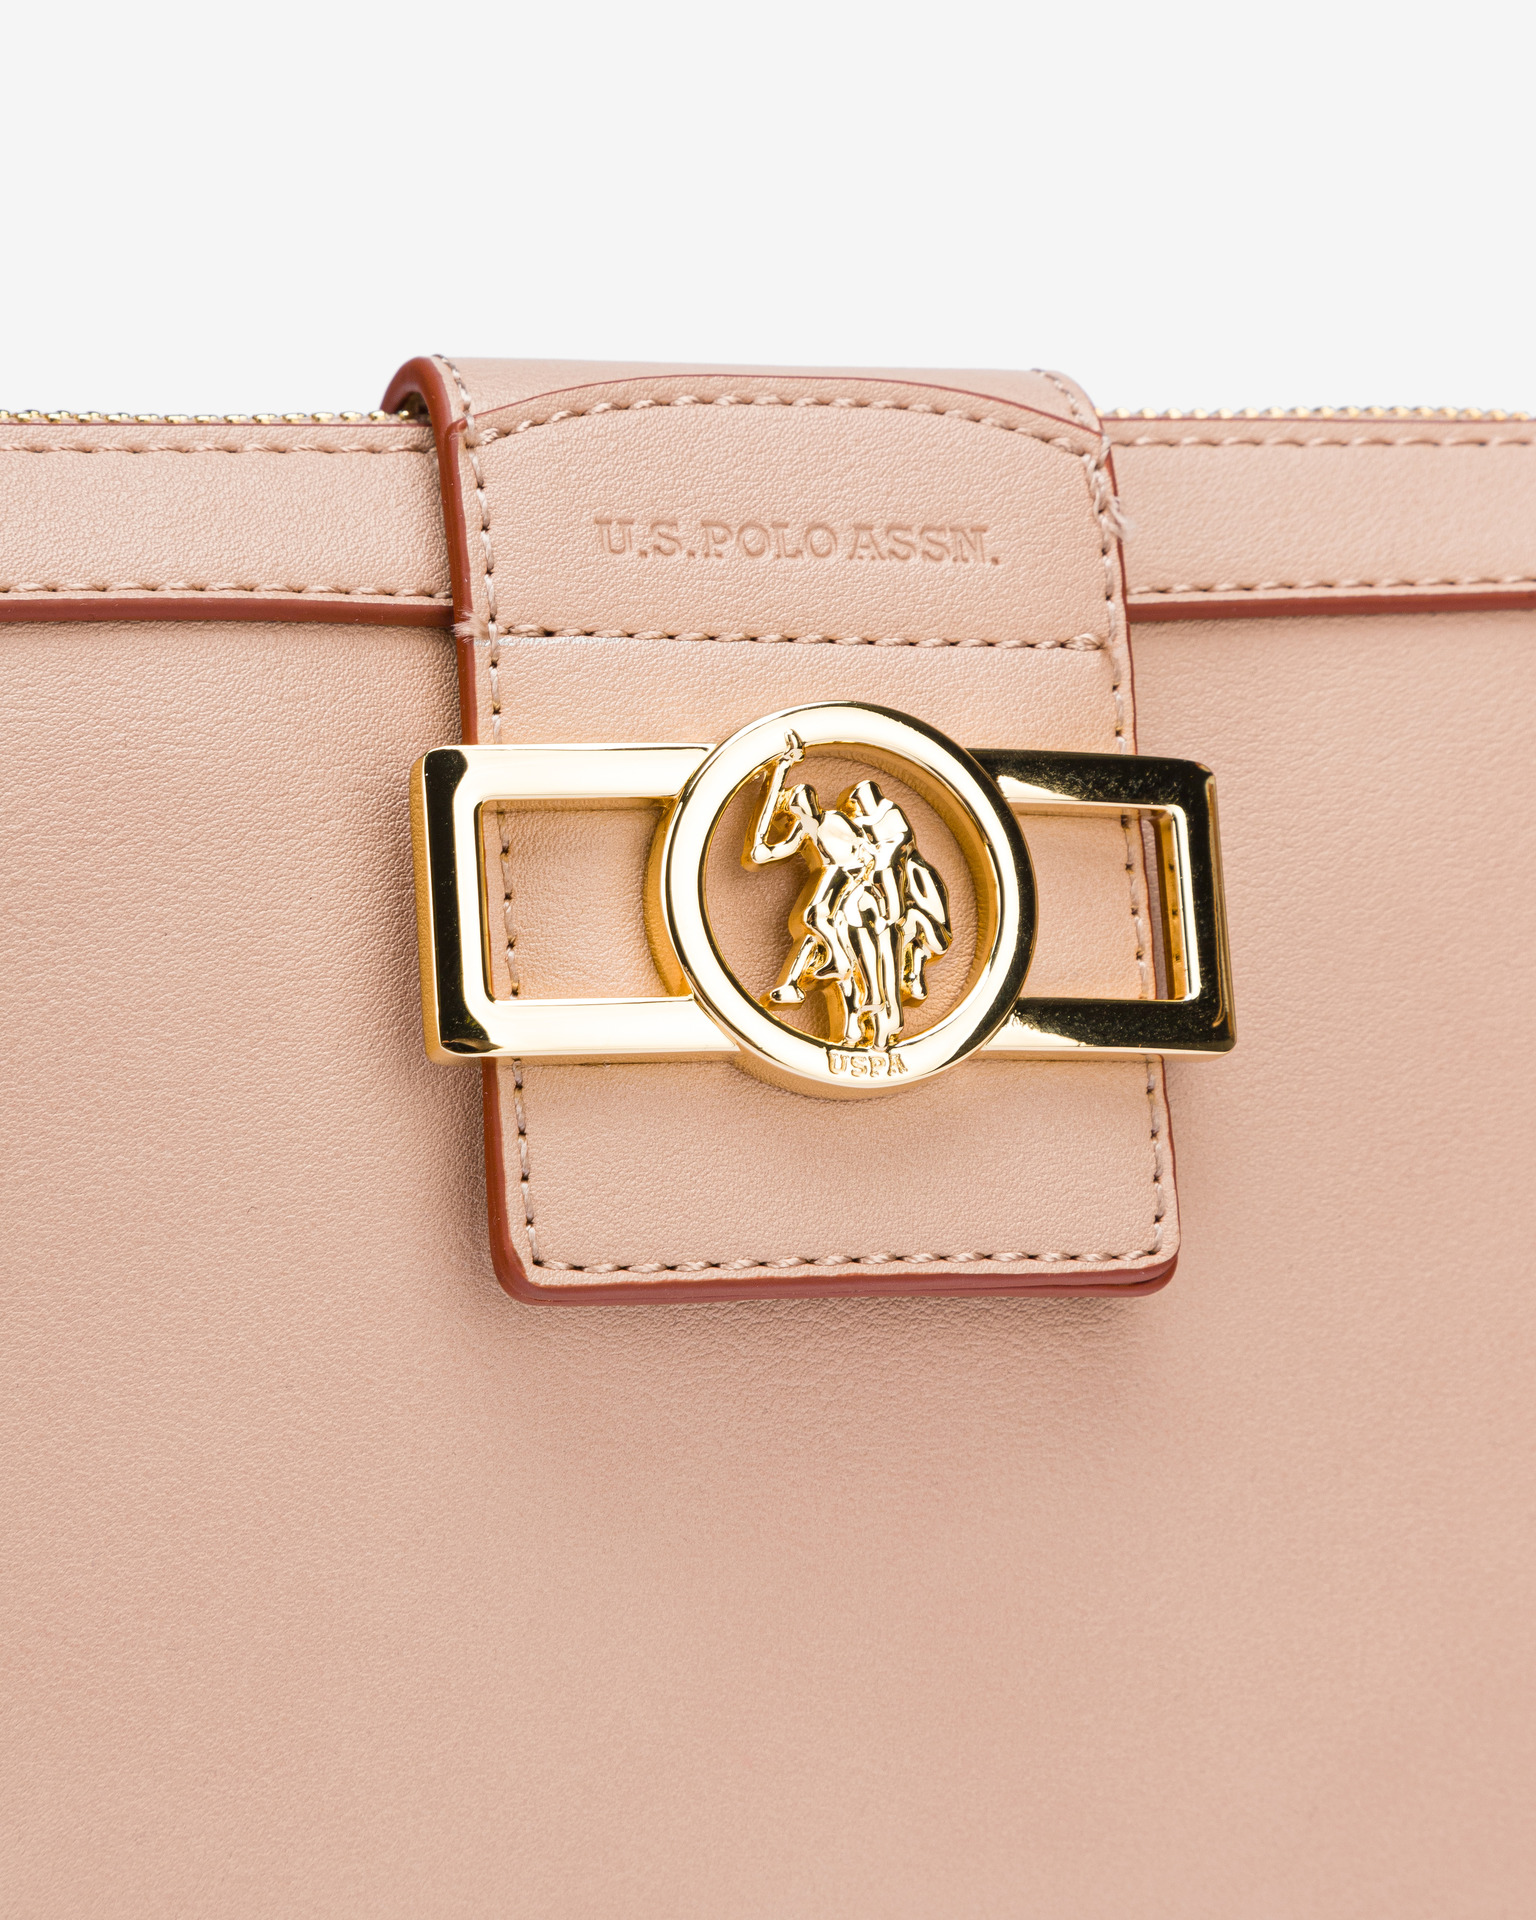 U.S. Polo Assn. Borsetta donna beige  U.S.